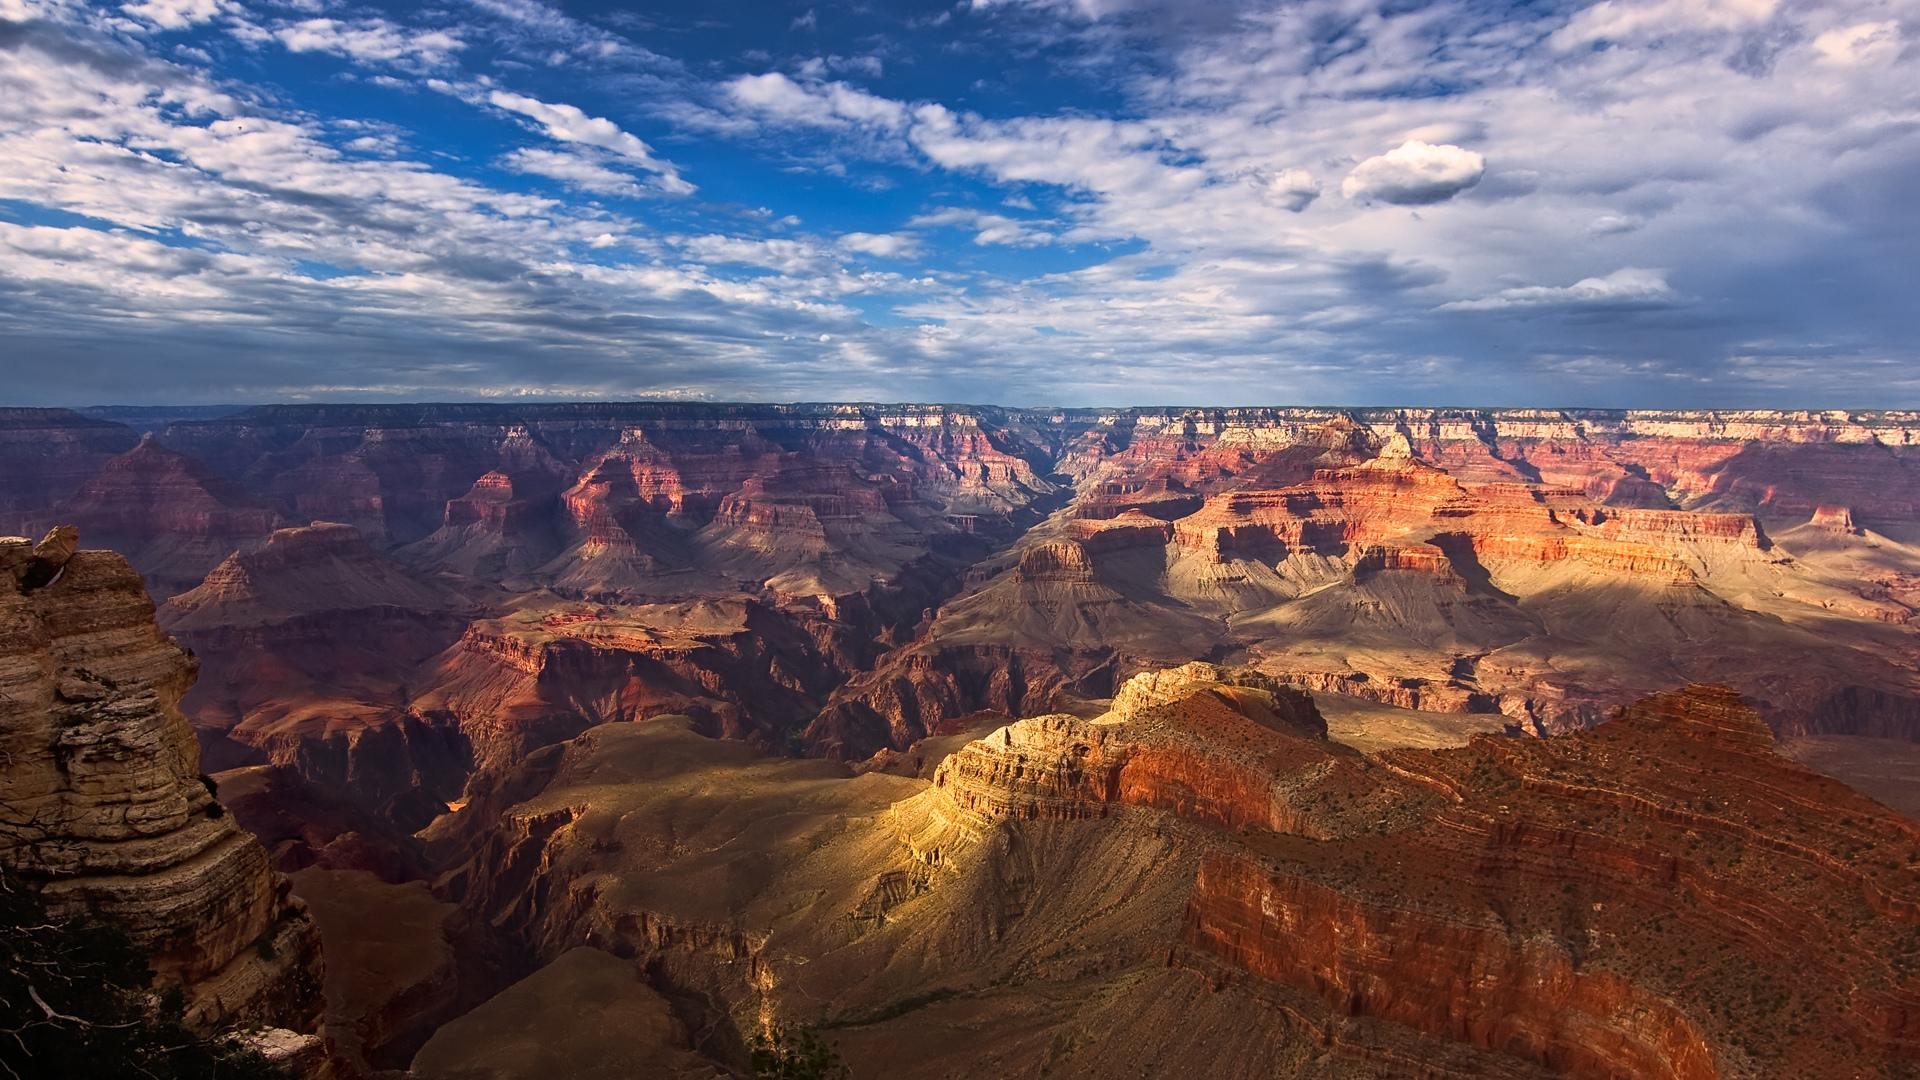 Grand Canyon clipart hd wallpaper BsnSCB Graphics) Download Canyon Wallpapers